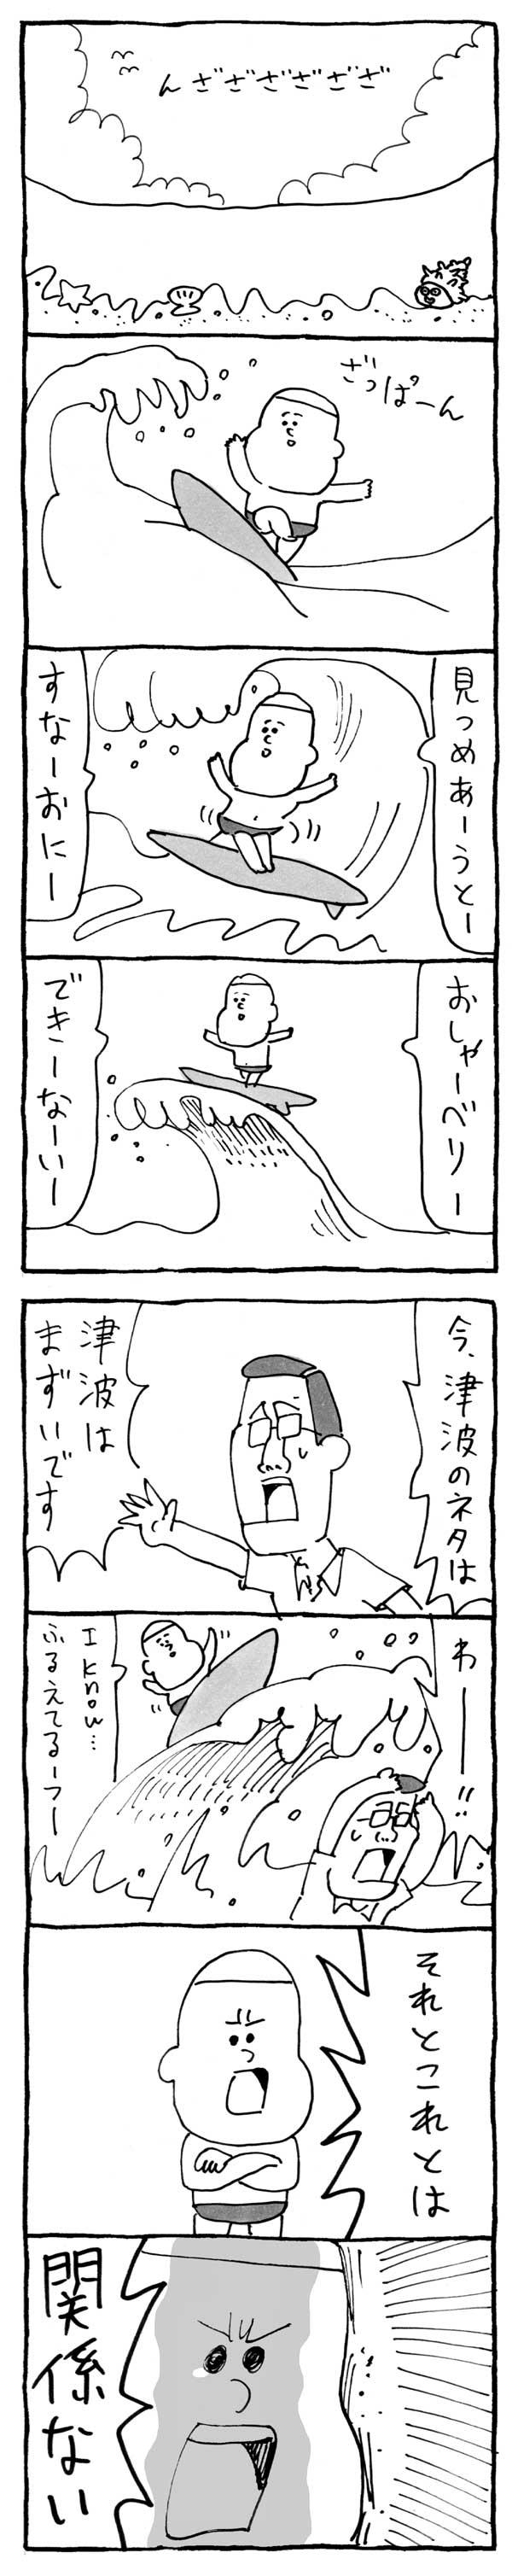 c0193497_16810.jpg